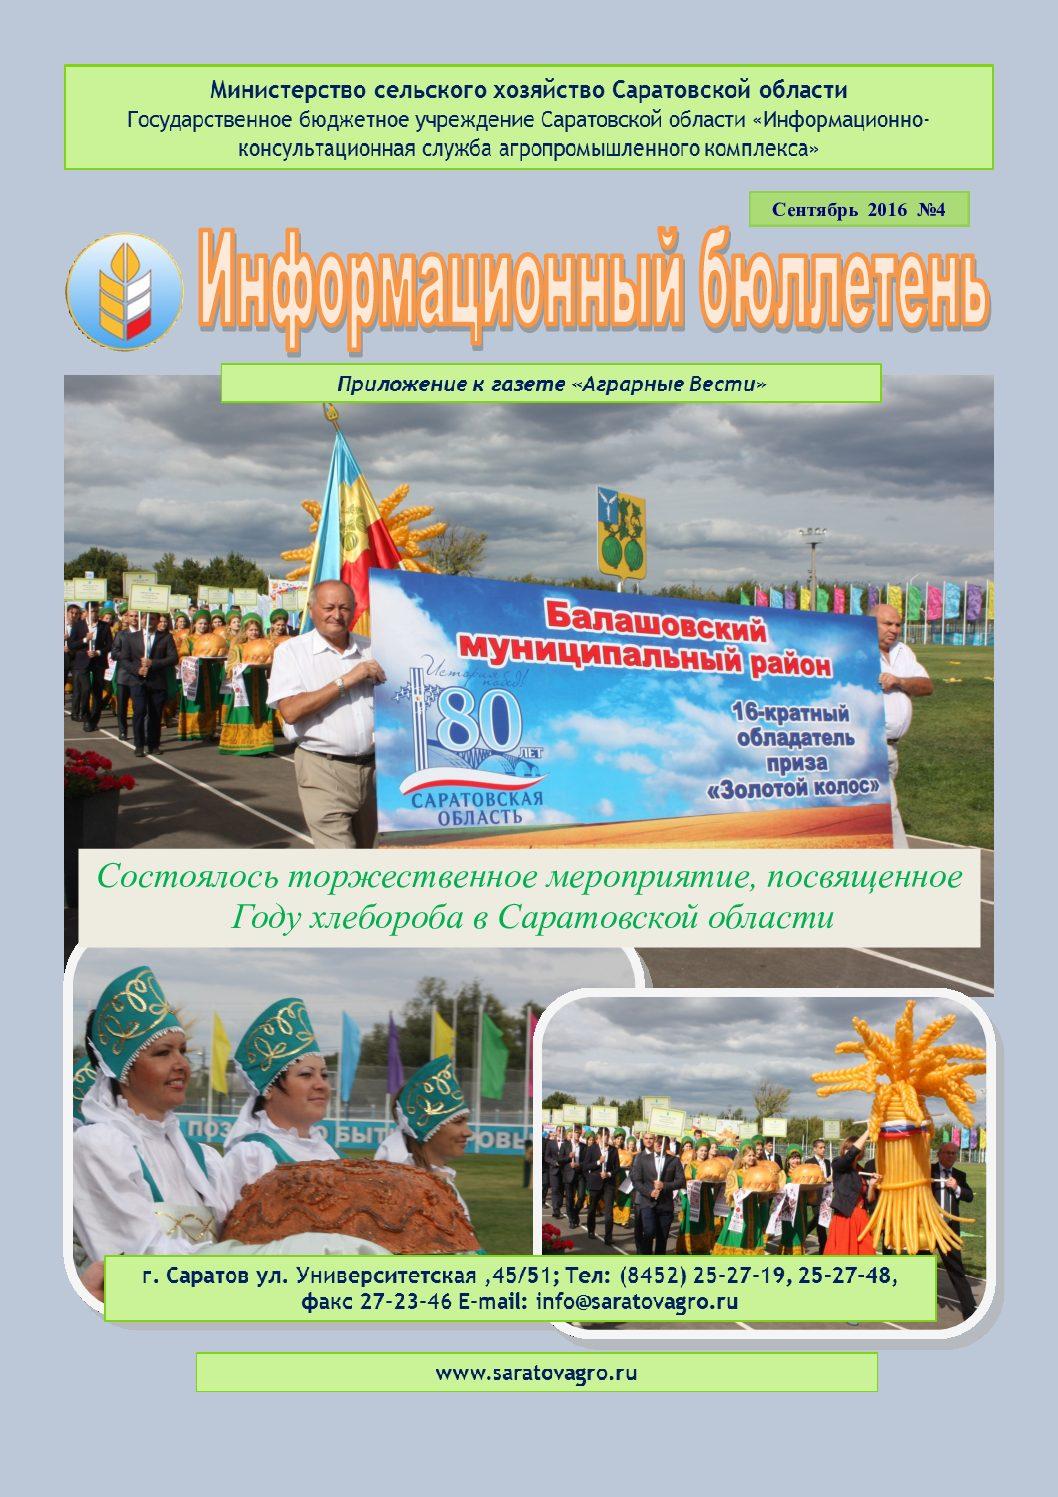 https://saratovagro.ru/wp-content/uploads/2020/08/№4-сентябрь-pdf.jpg